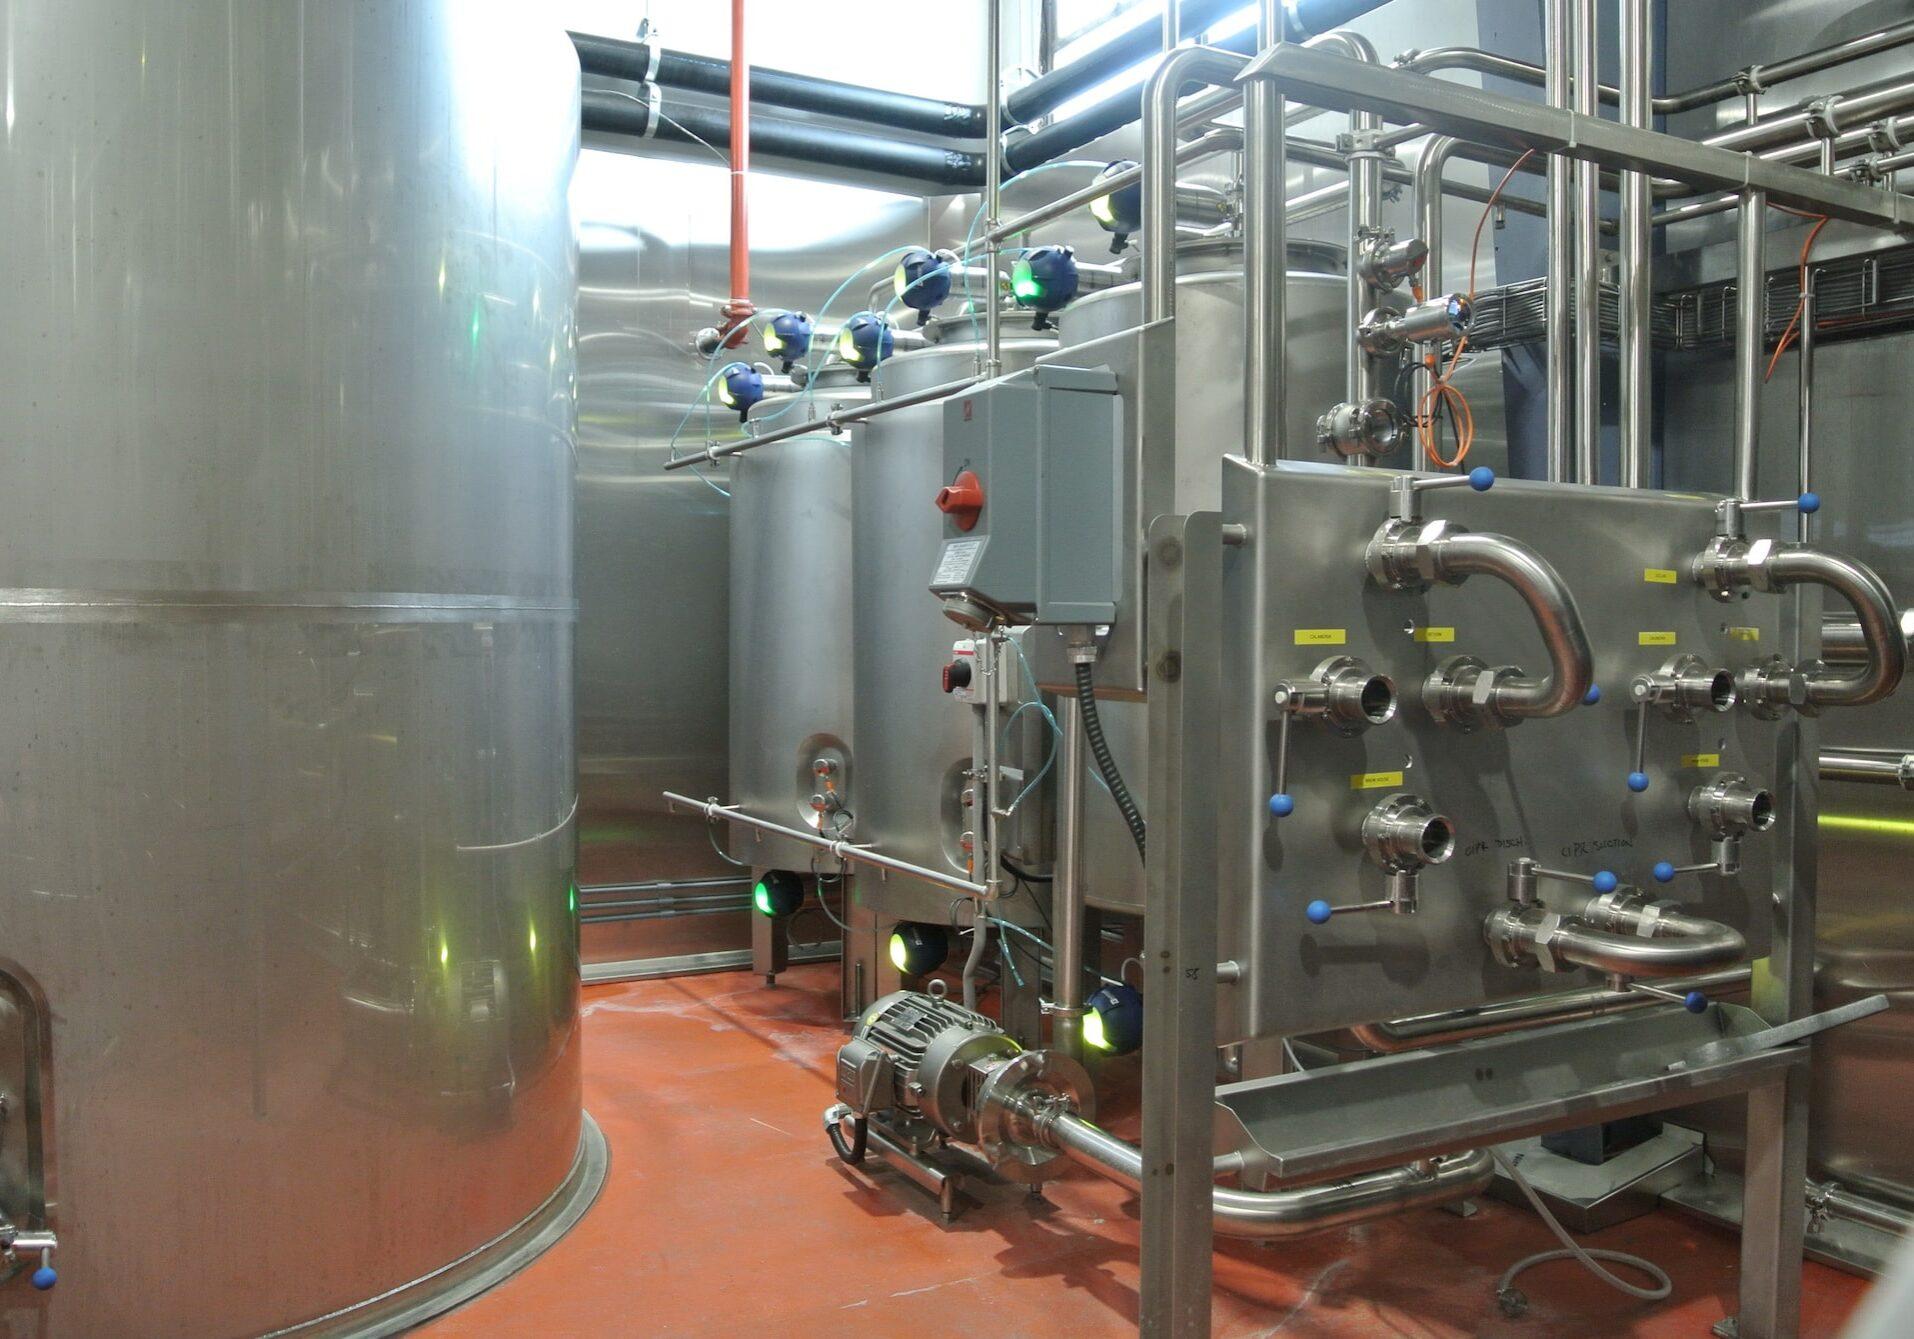 Pure Ingenuity custom fabrication steel brewery equipment.